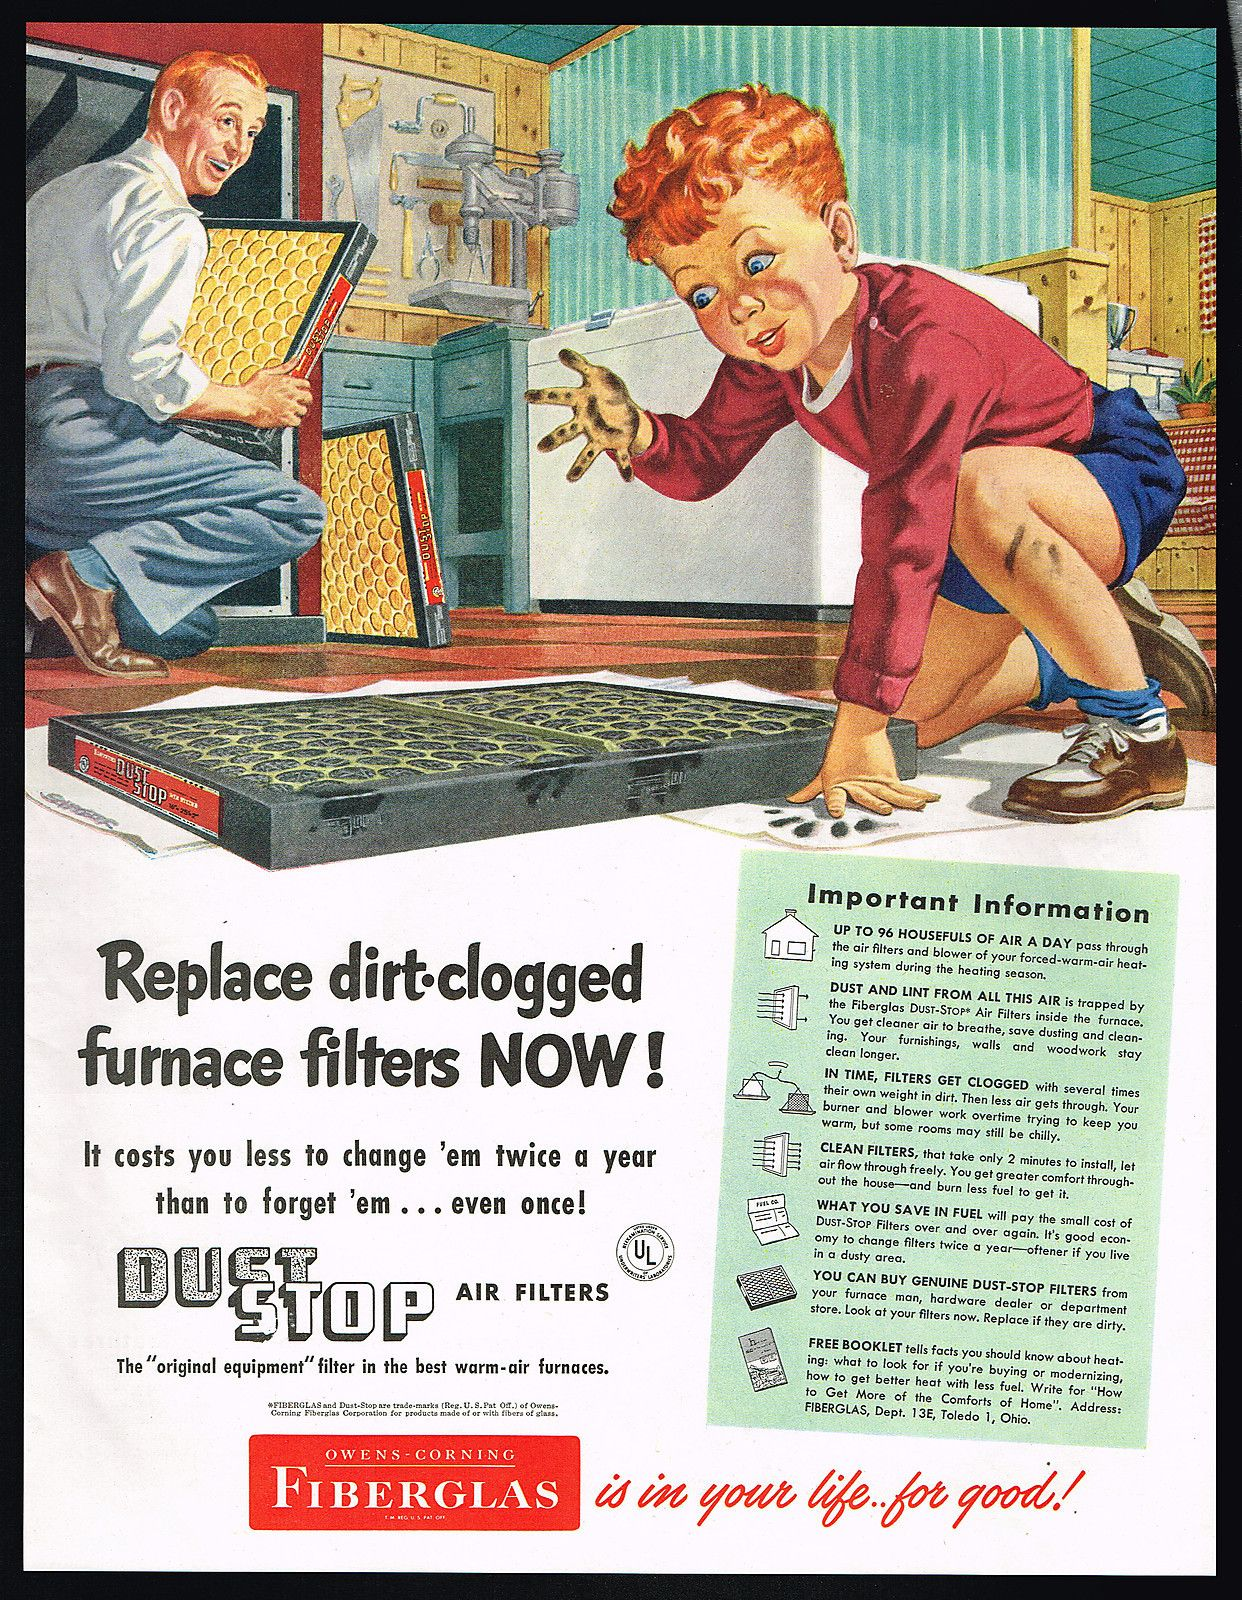 1951 Owens Corning Fiberglas Furnace Filters Redhead Boy